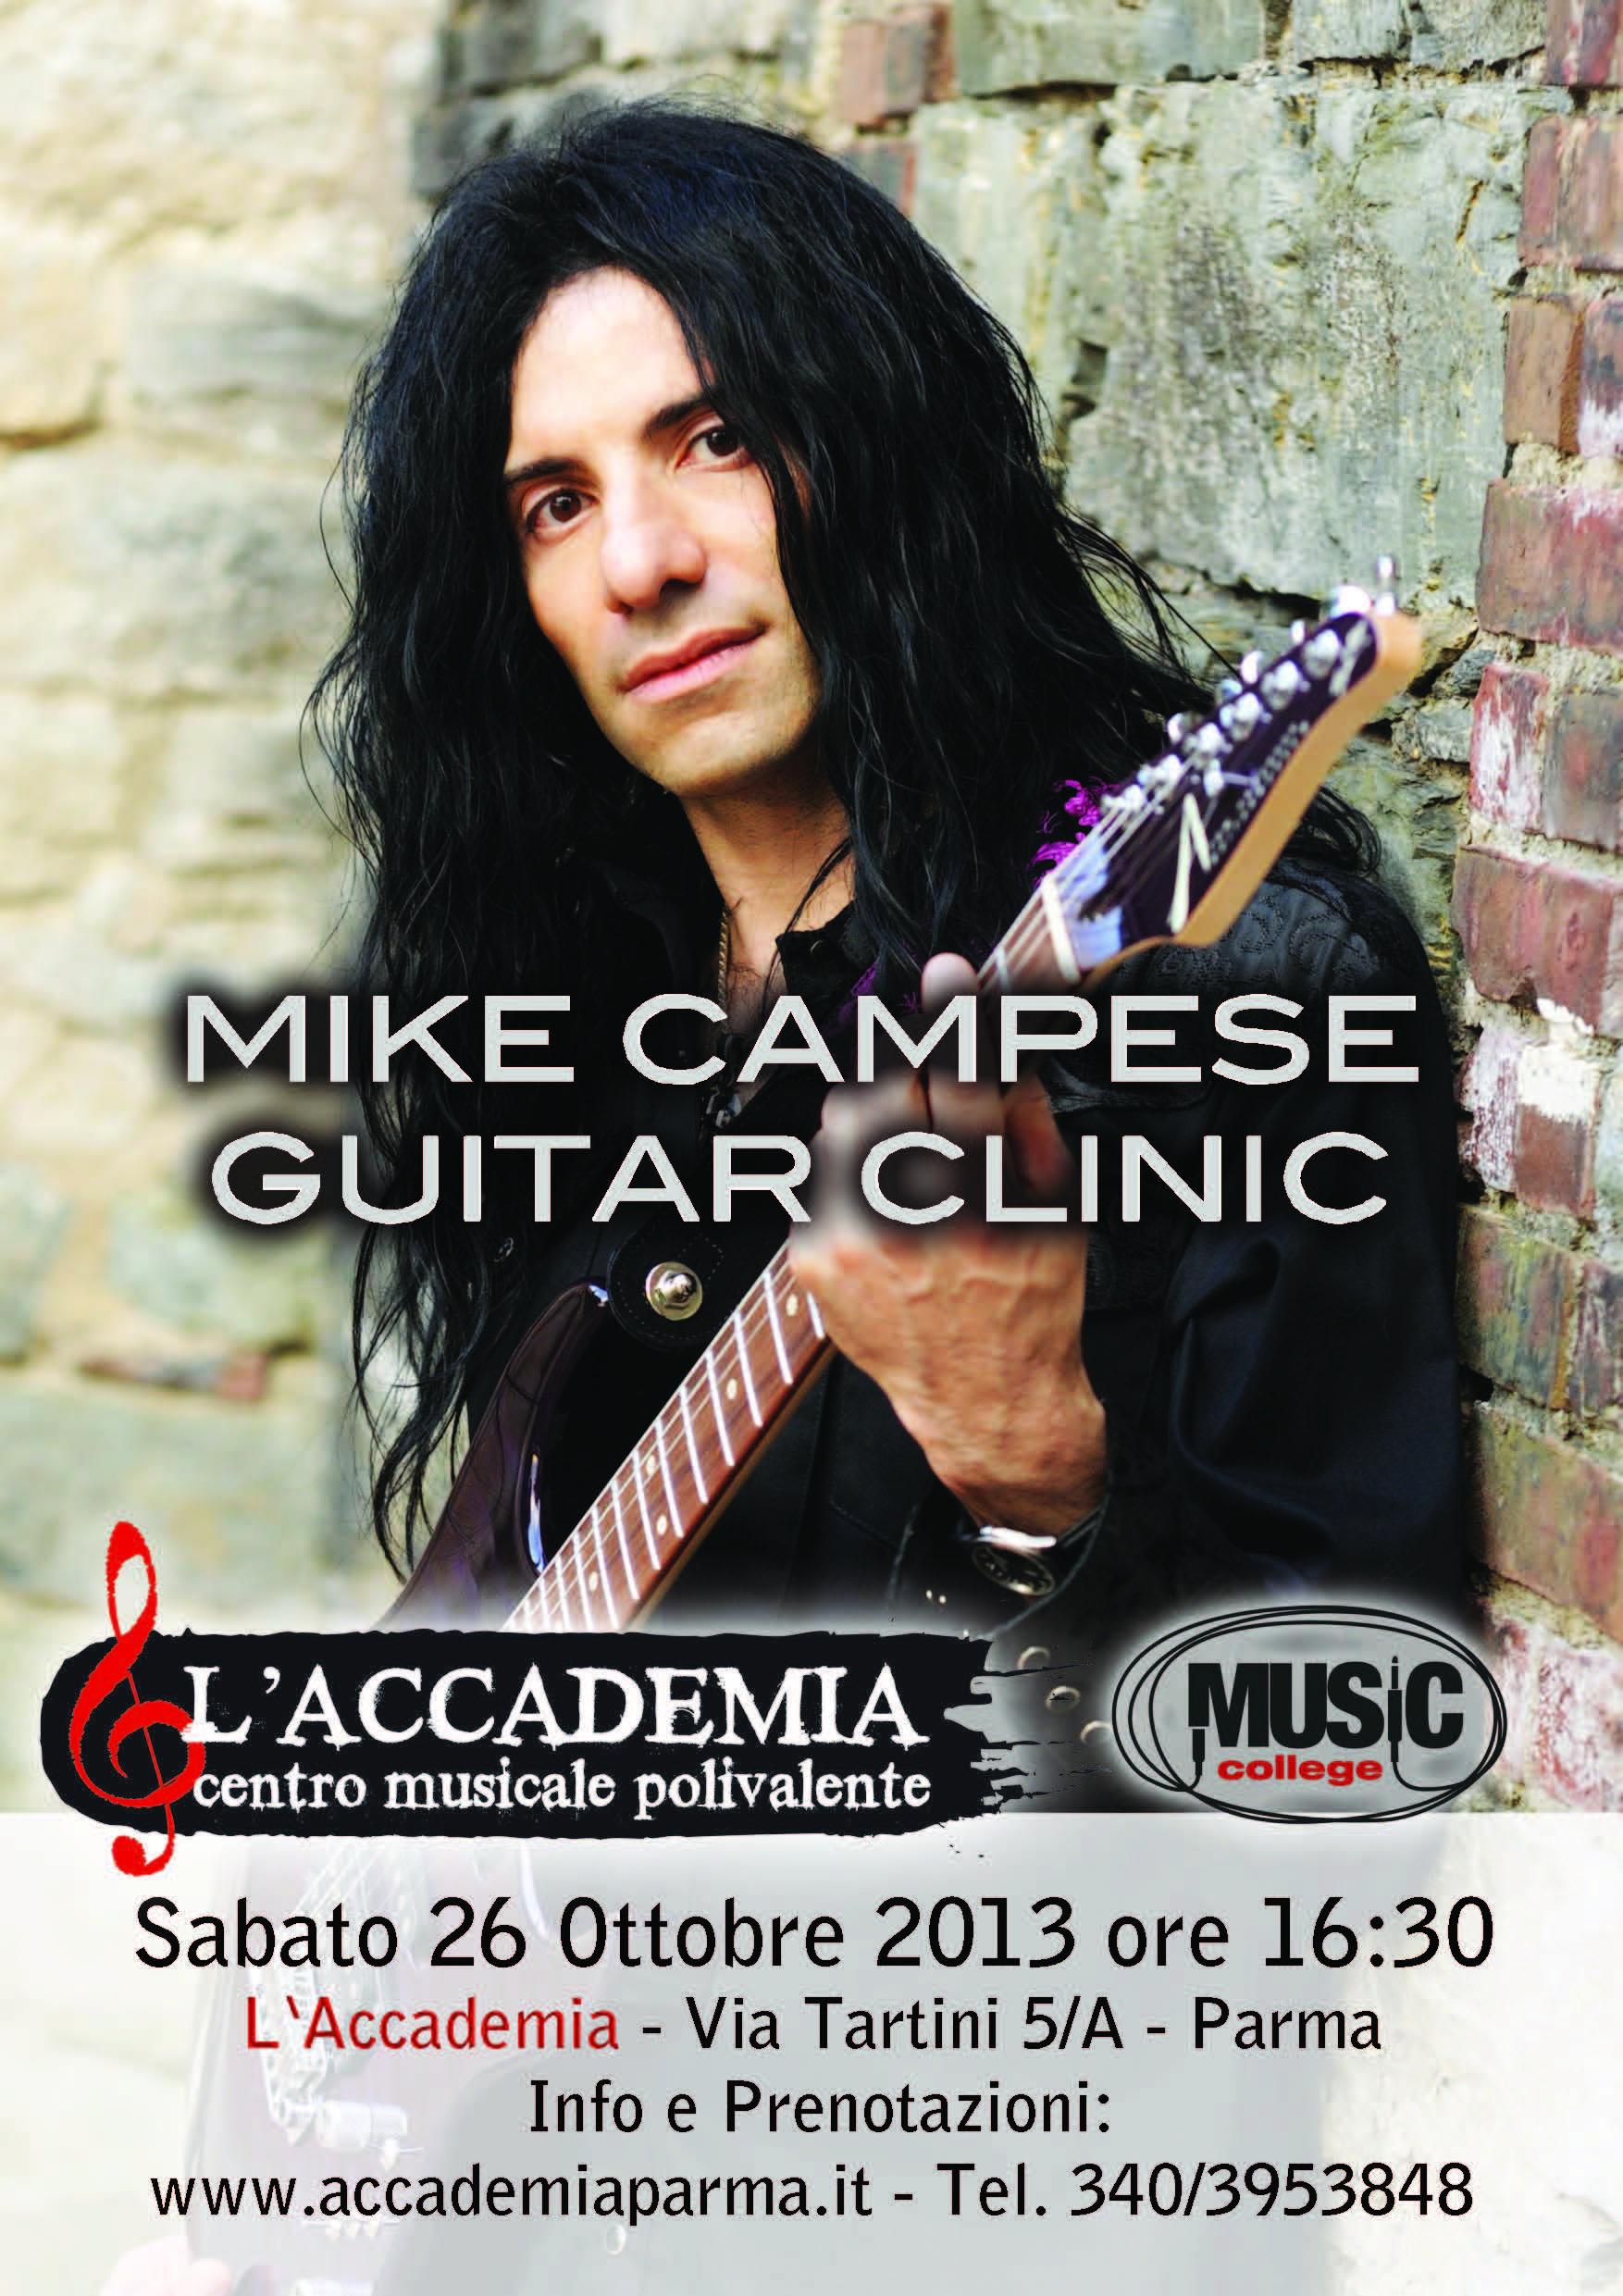 Mike Campese: clinic a Parma per il chitarrista